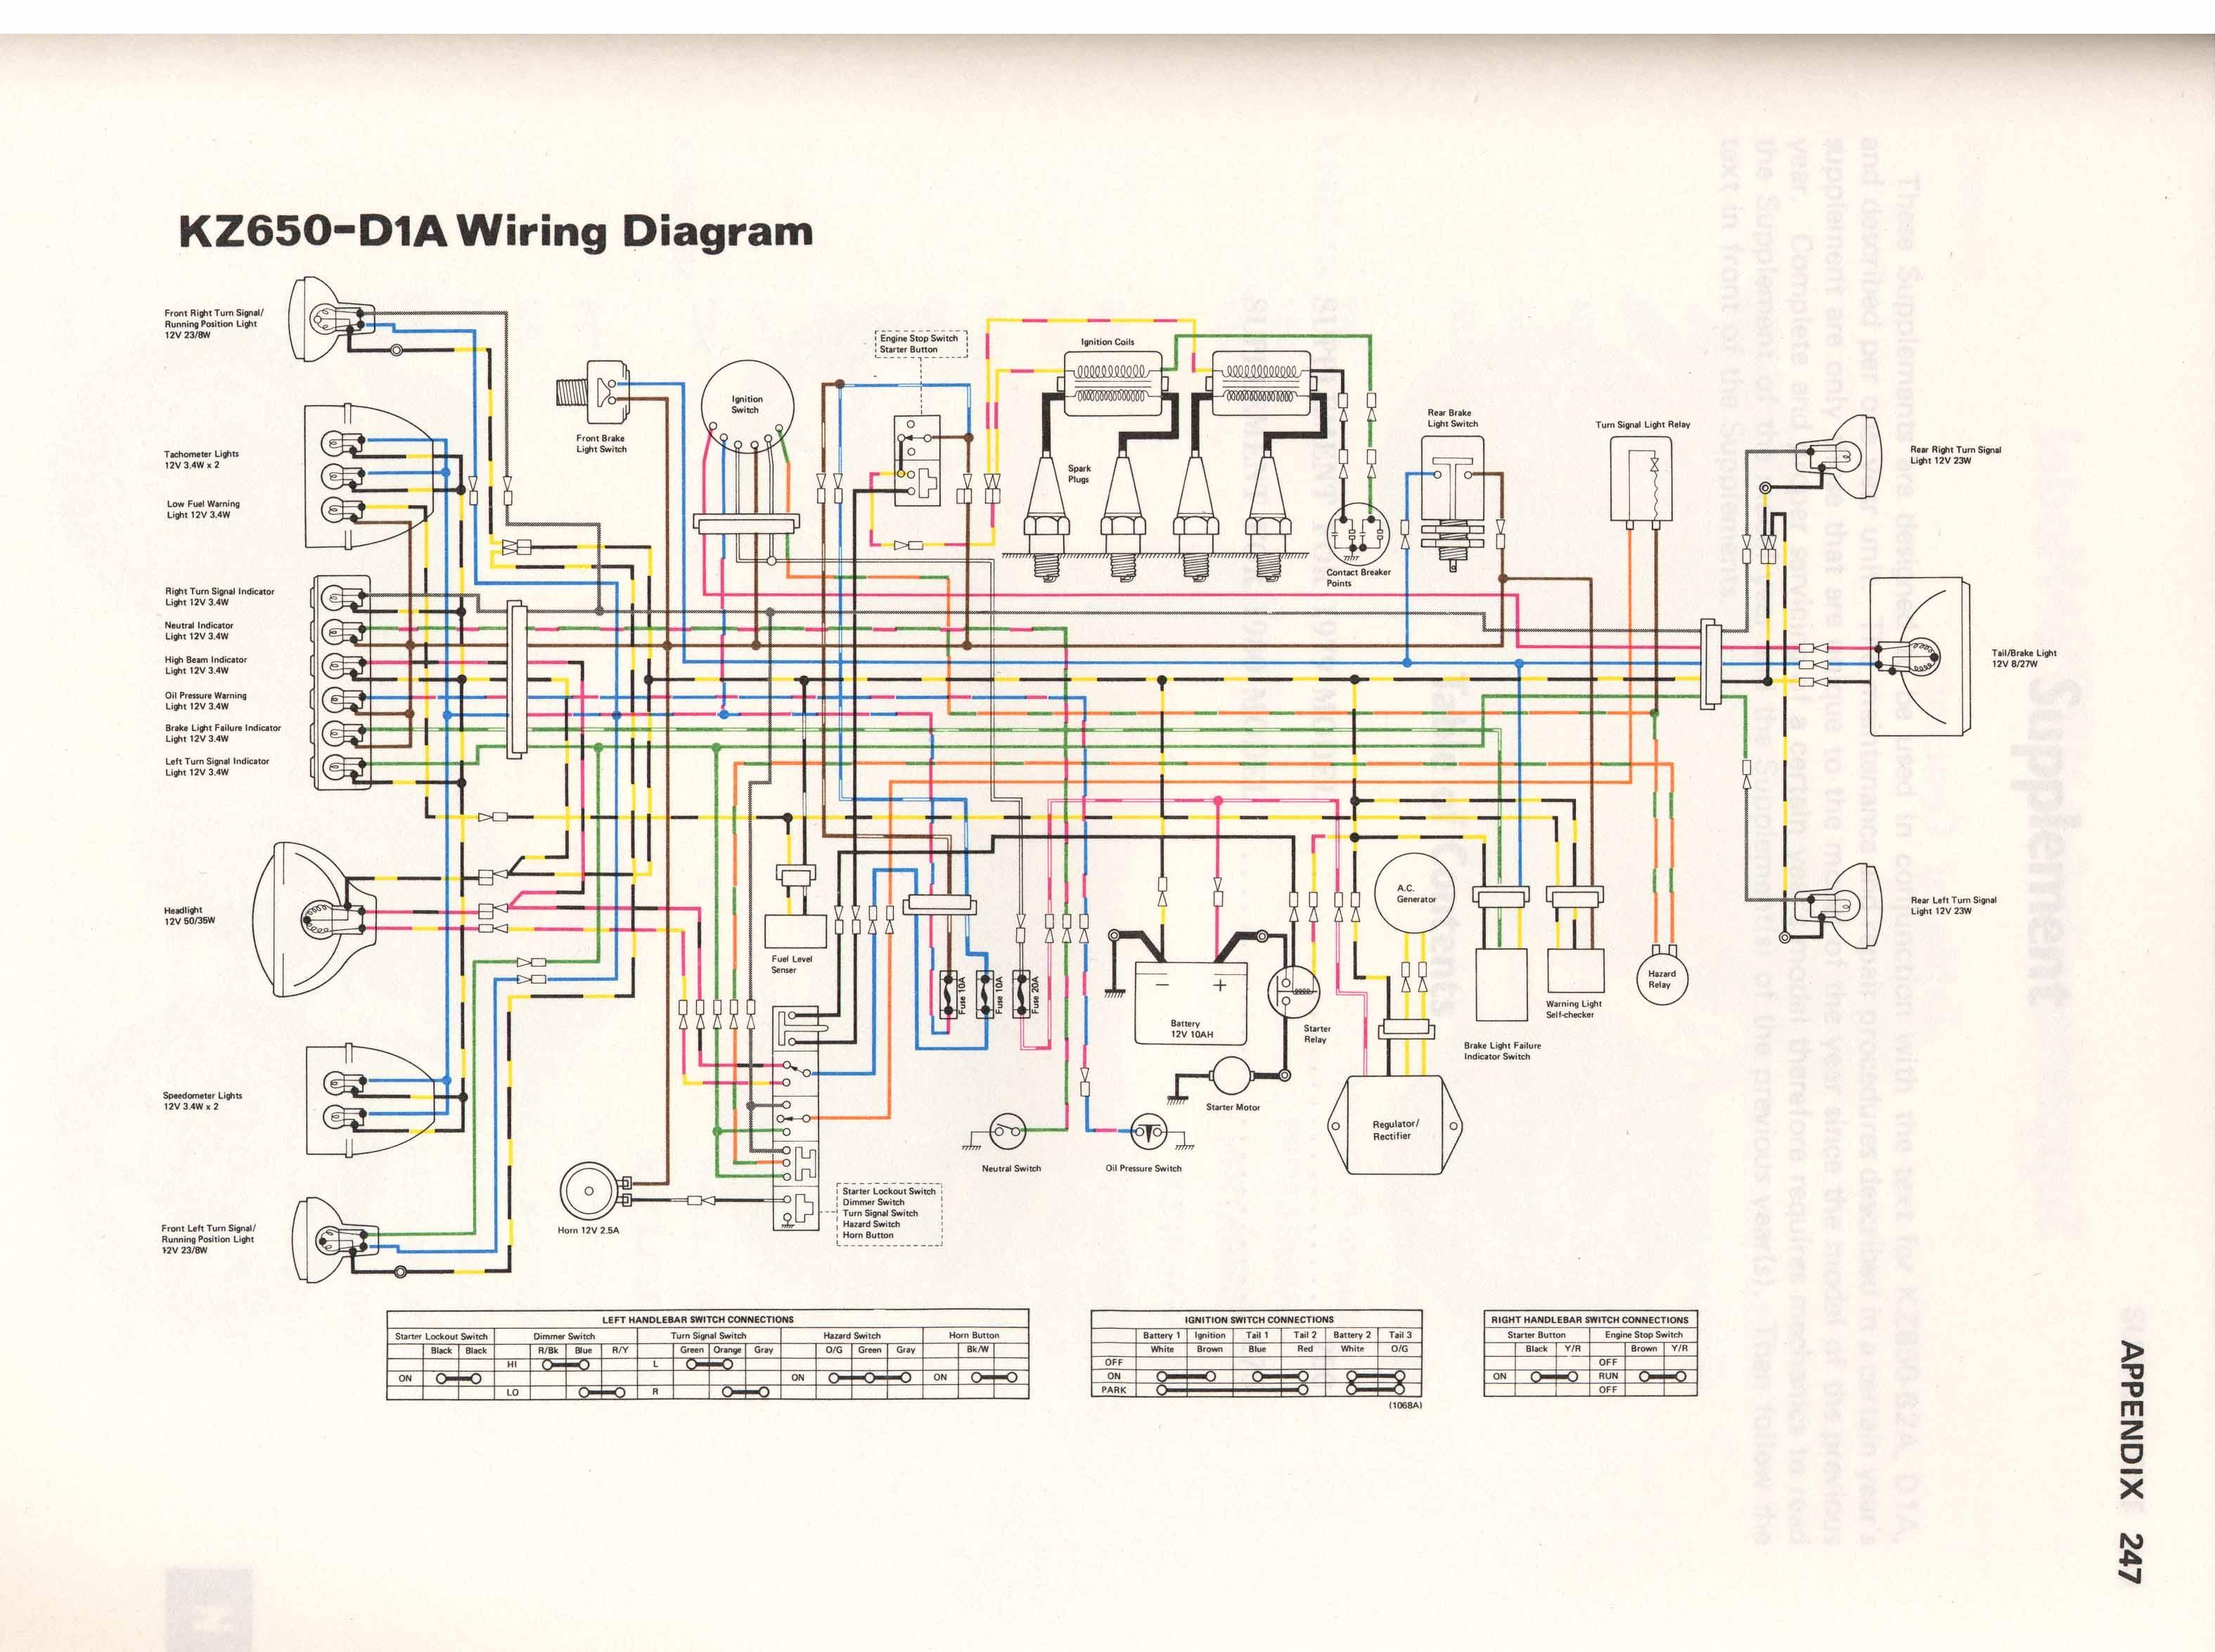 1989 Ford Ltd Wiring Diagram Library. Kz750 80 Wiring Diagram Schematics Diagrams \u2022 Ford Truck Alternator 76 Ltd. Ford. 76 Ltd Ford Starting System Diagram At Scoala.co